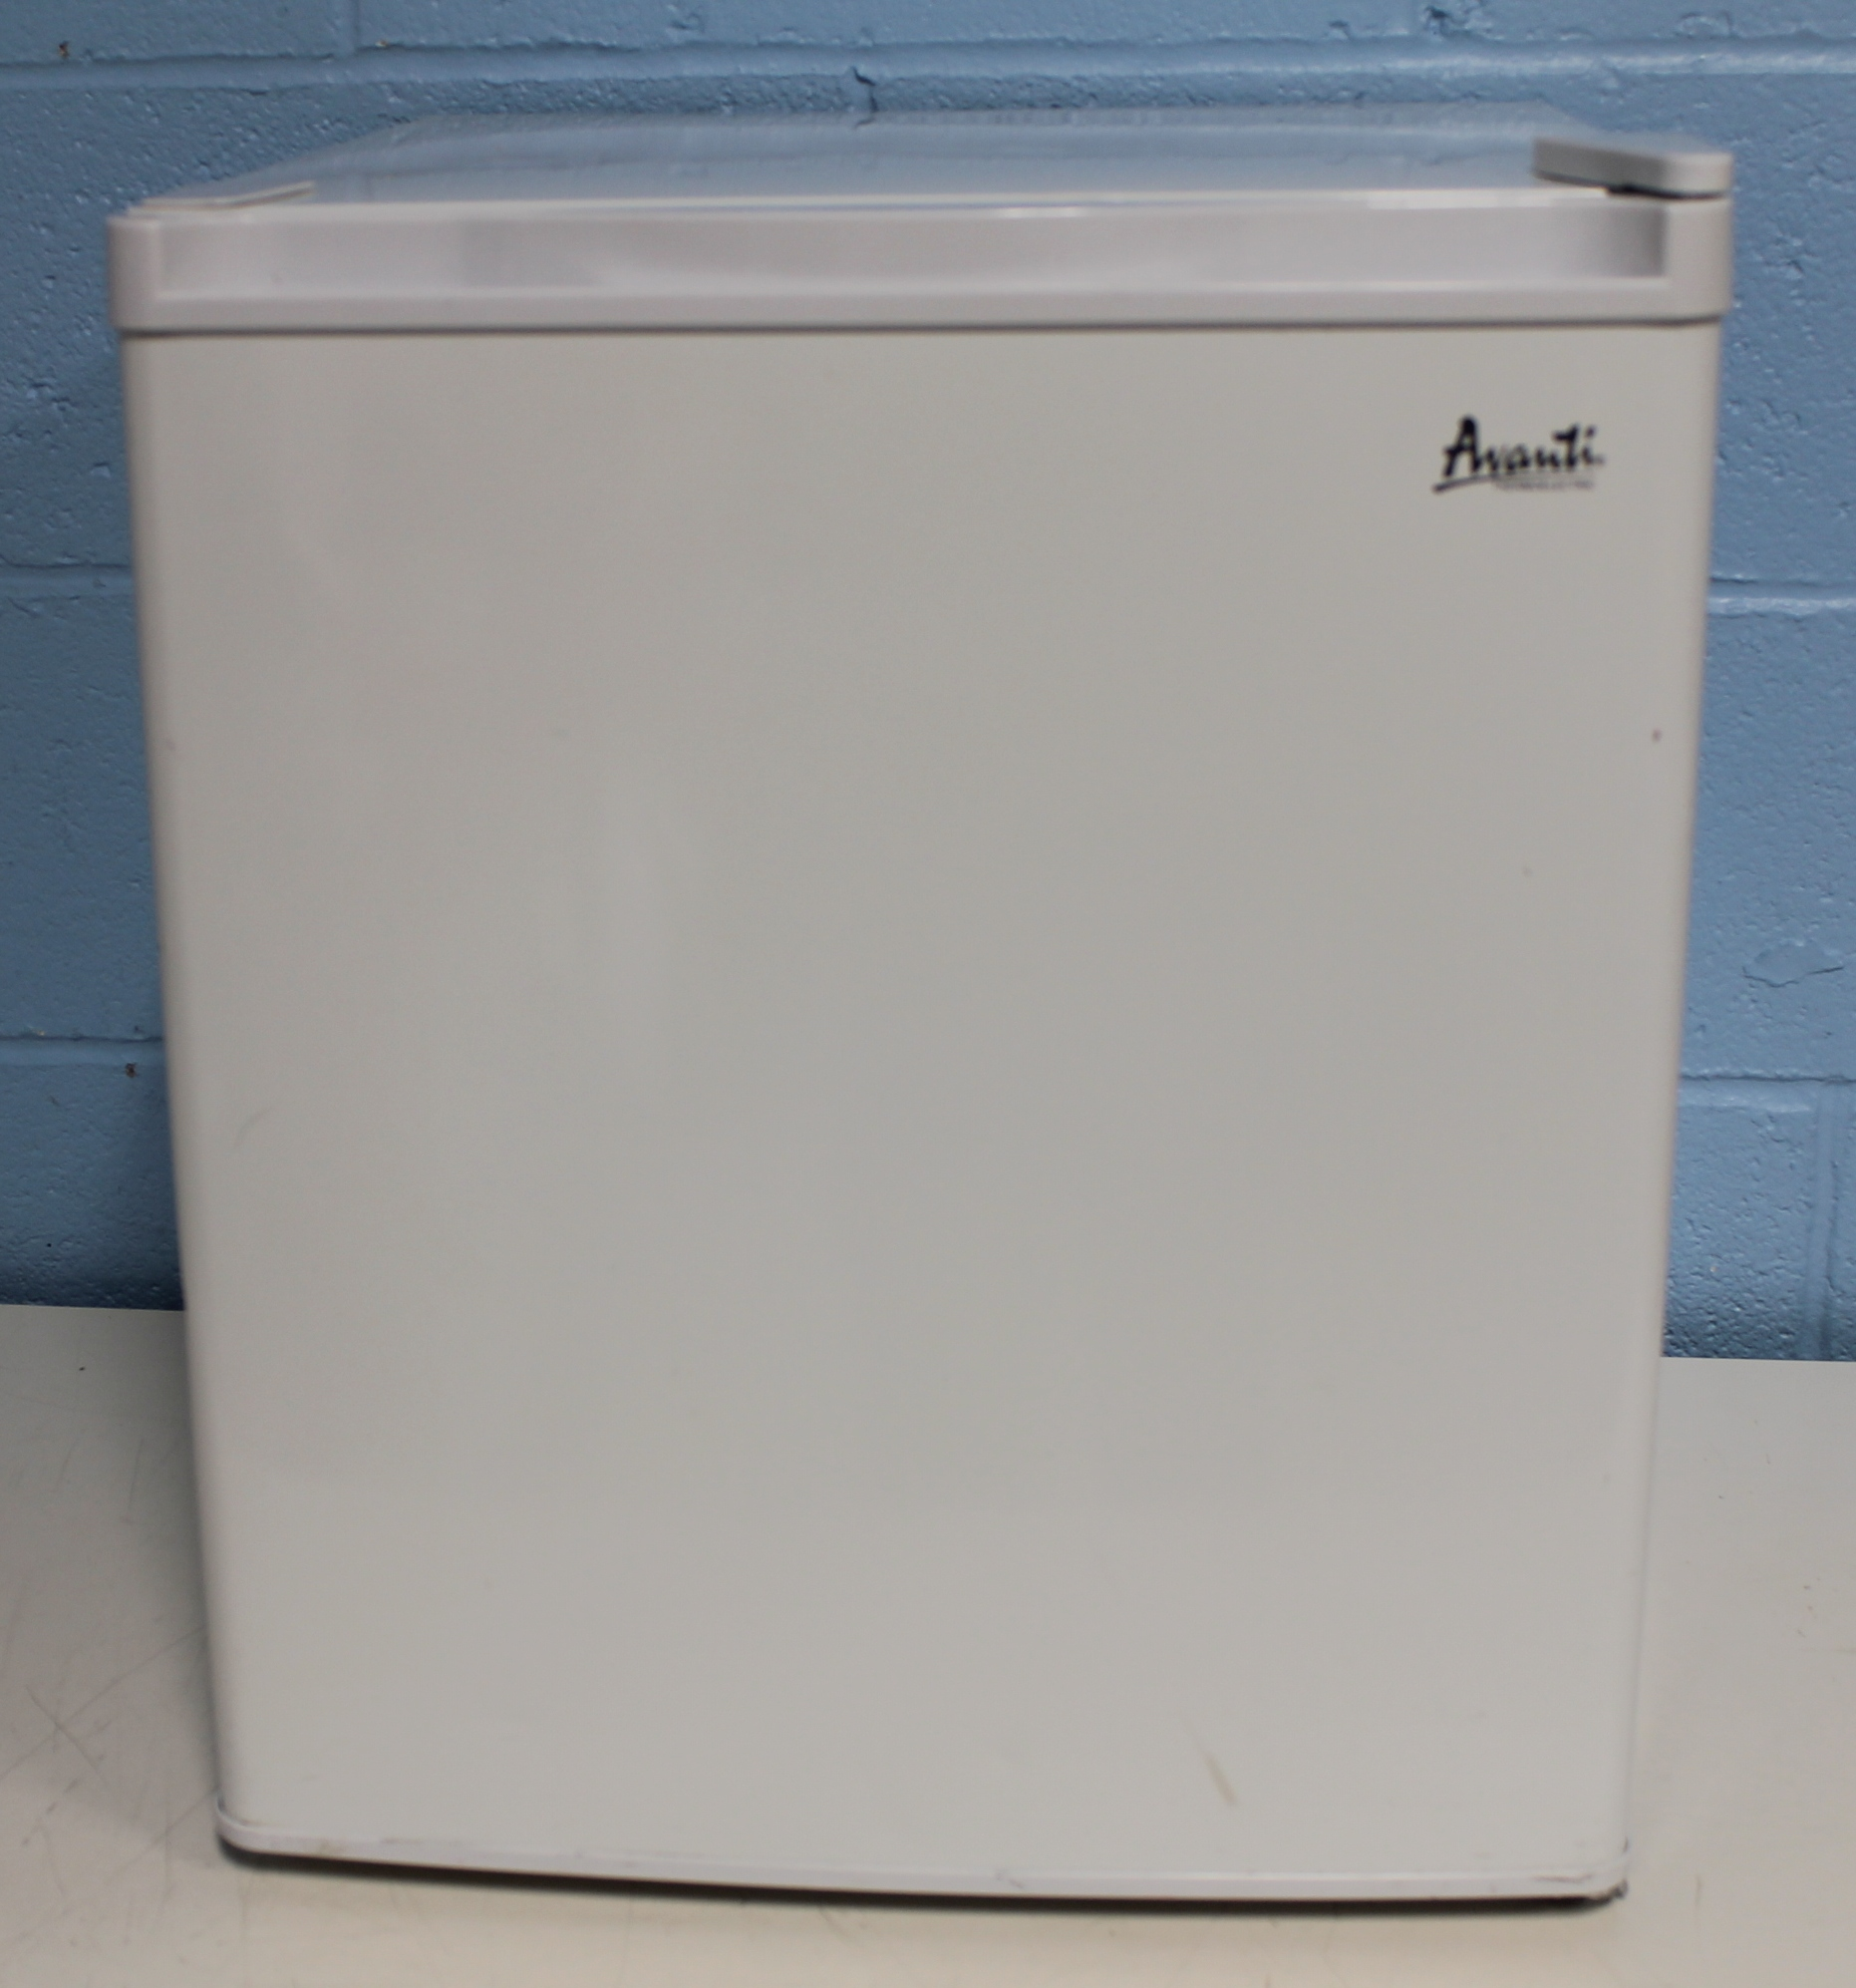 refurbished thermoelectric avanti ec15w2 compact refrigerator rh americanlaboratorytrading com Compact Appliances Avanti Washer and Dryer